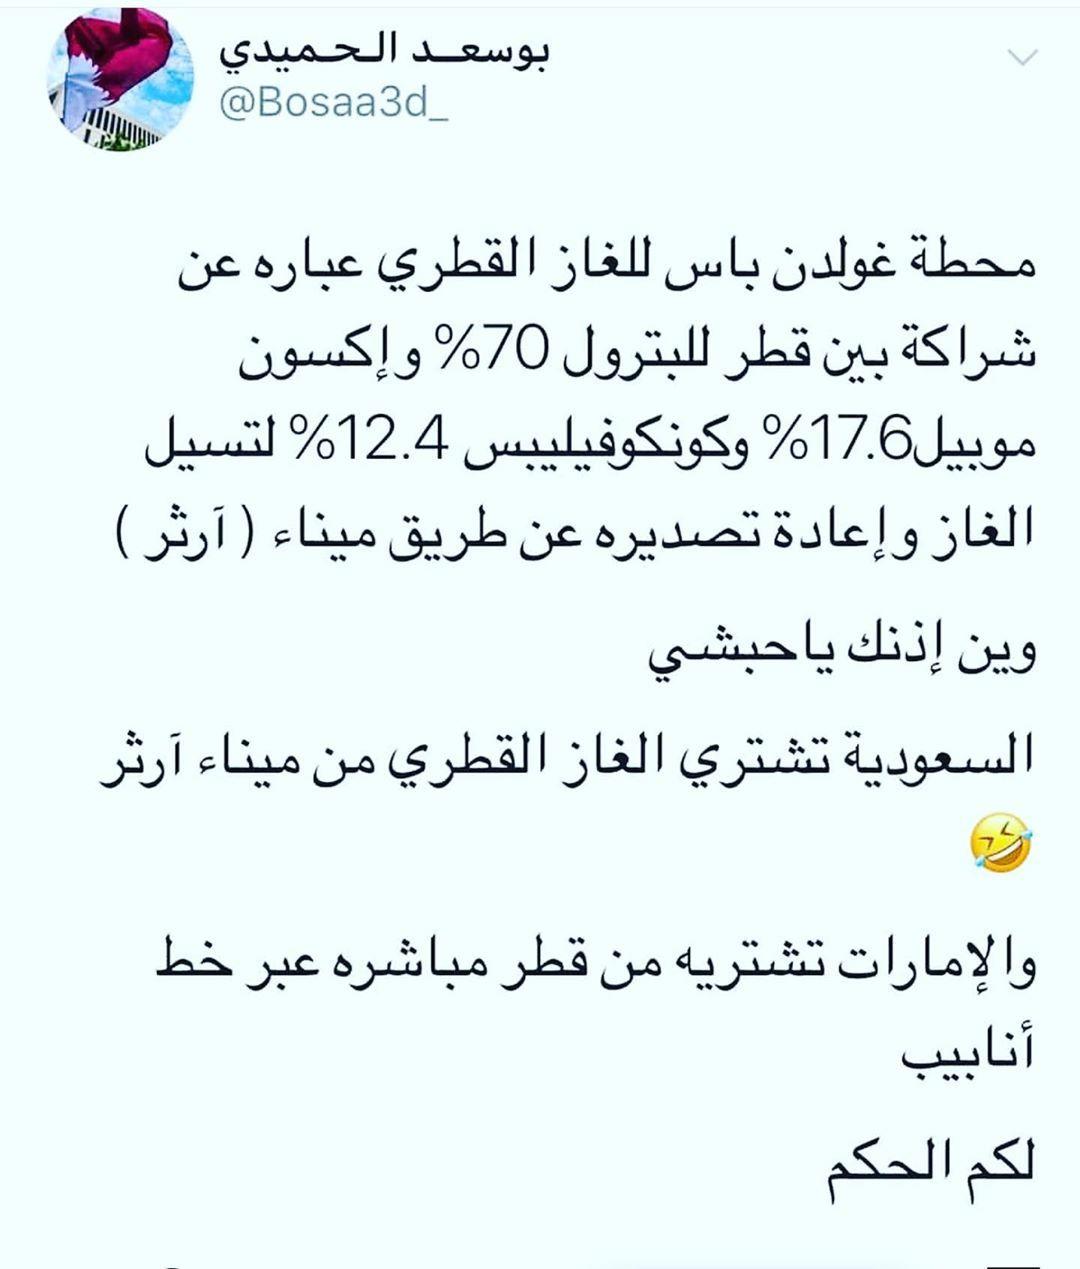 يا امة تضحكت من جهلها الاعداء ا لل ه م ص ل ع ل ى م ح م د و ال م ح م د Gcc Bahrain Ksa Alalamnews Kuwait Egypt L Math Math Equations Ewg